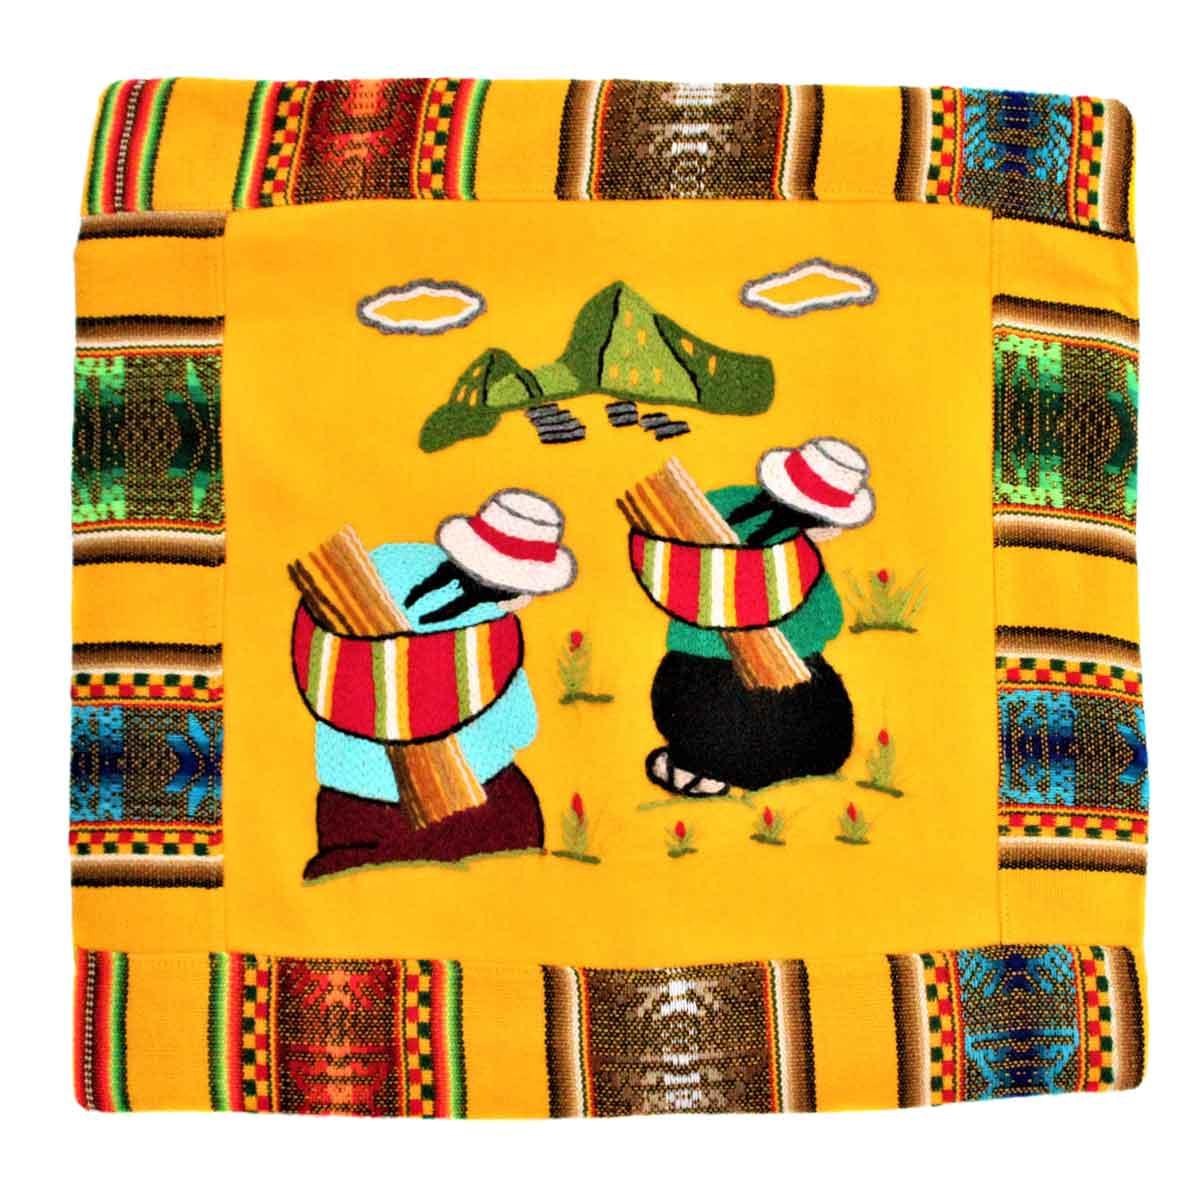 Inka-Products-Housse Coussin Péruvienne-Jaune Las Chismosas